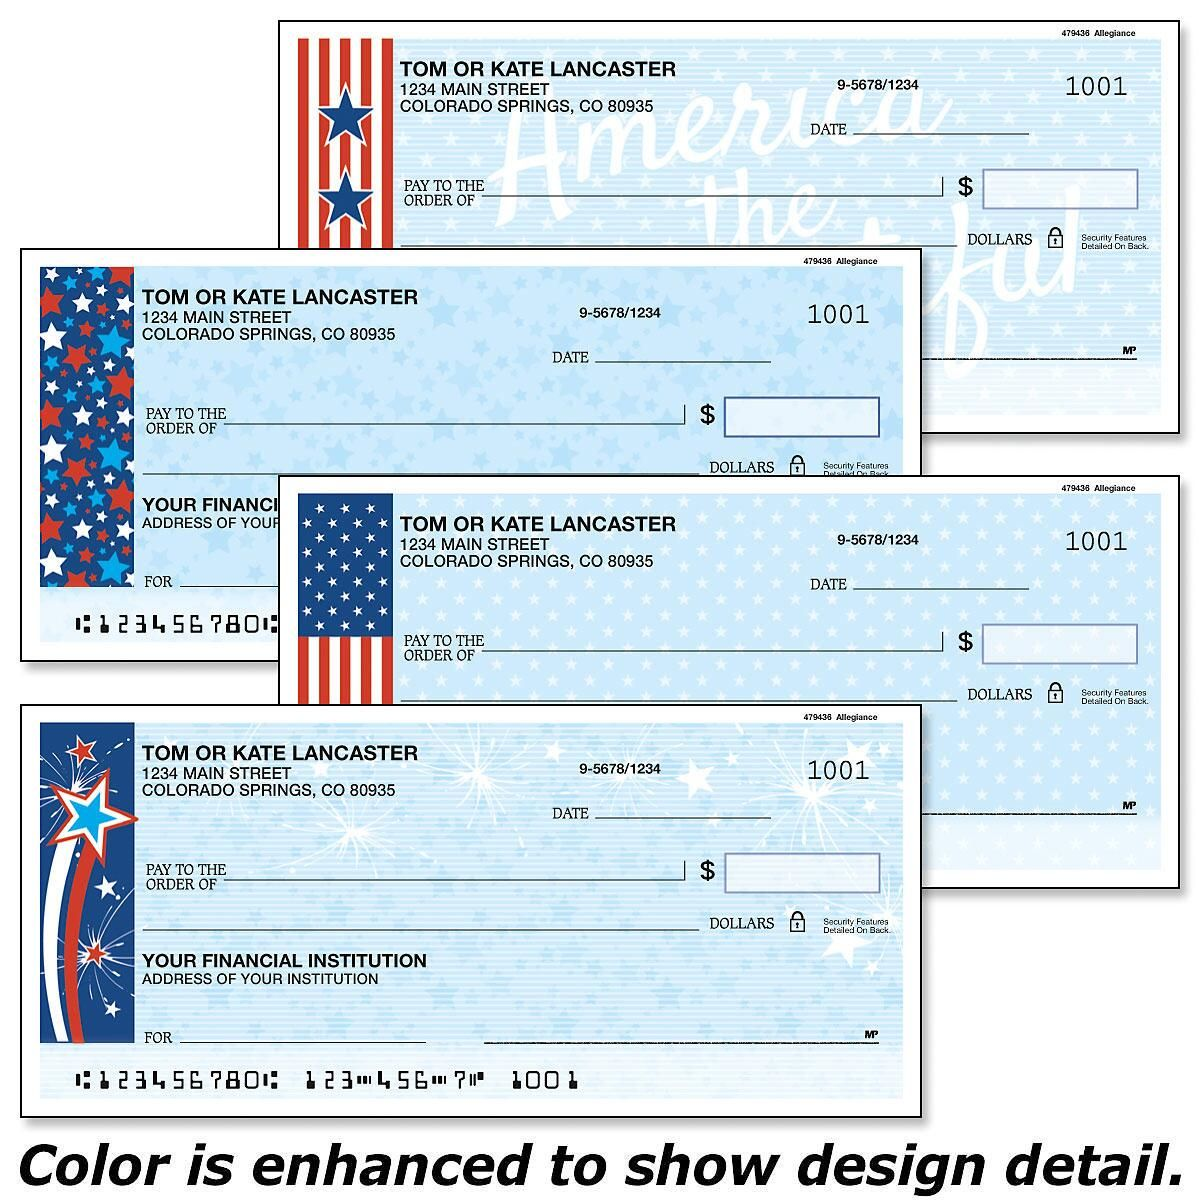 Allegiance Single Checks